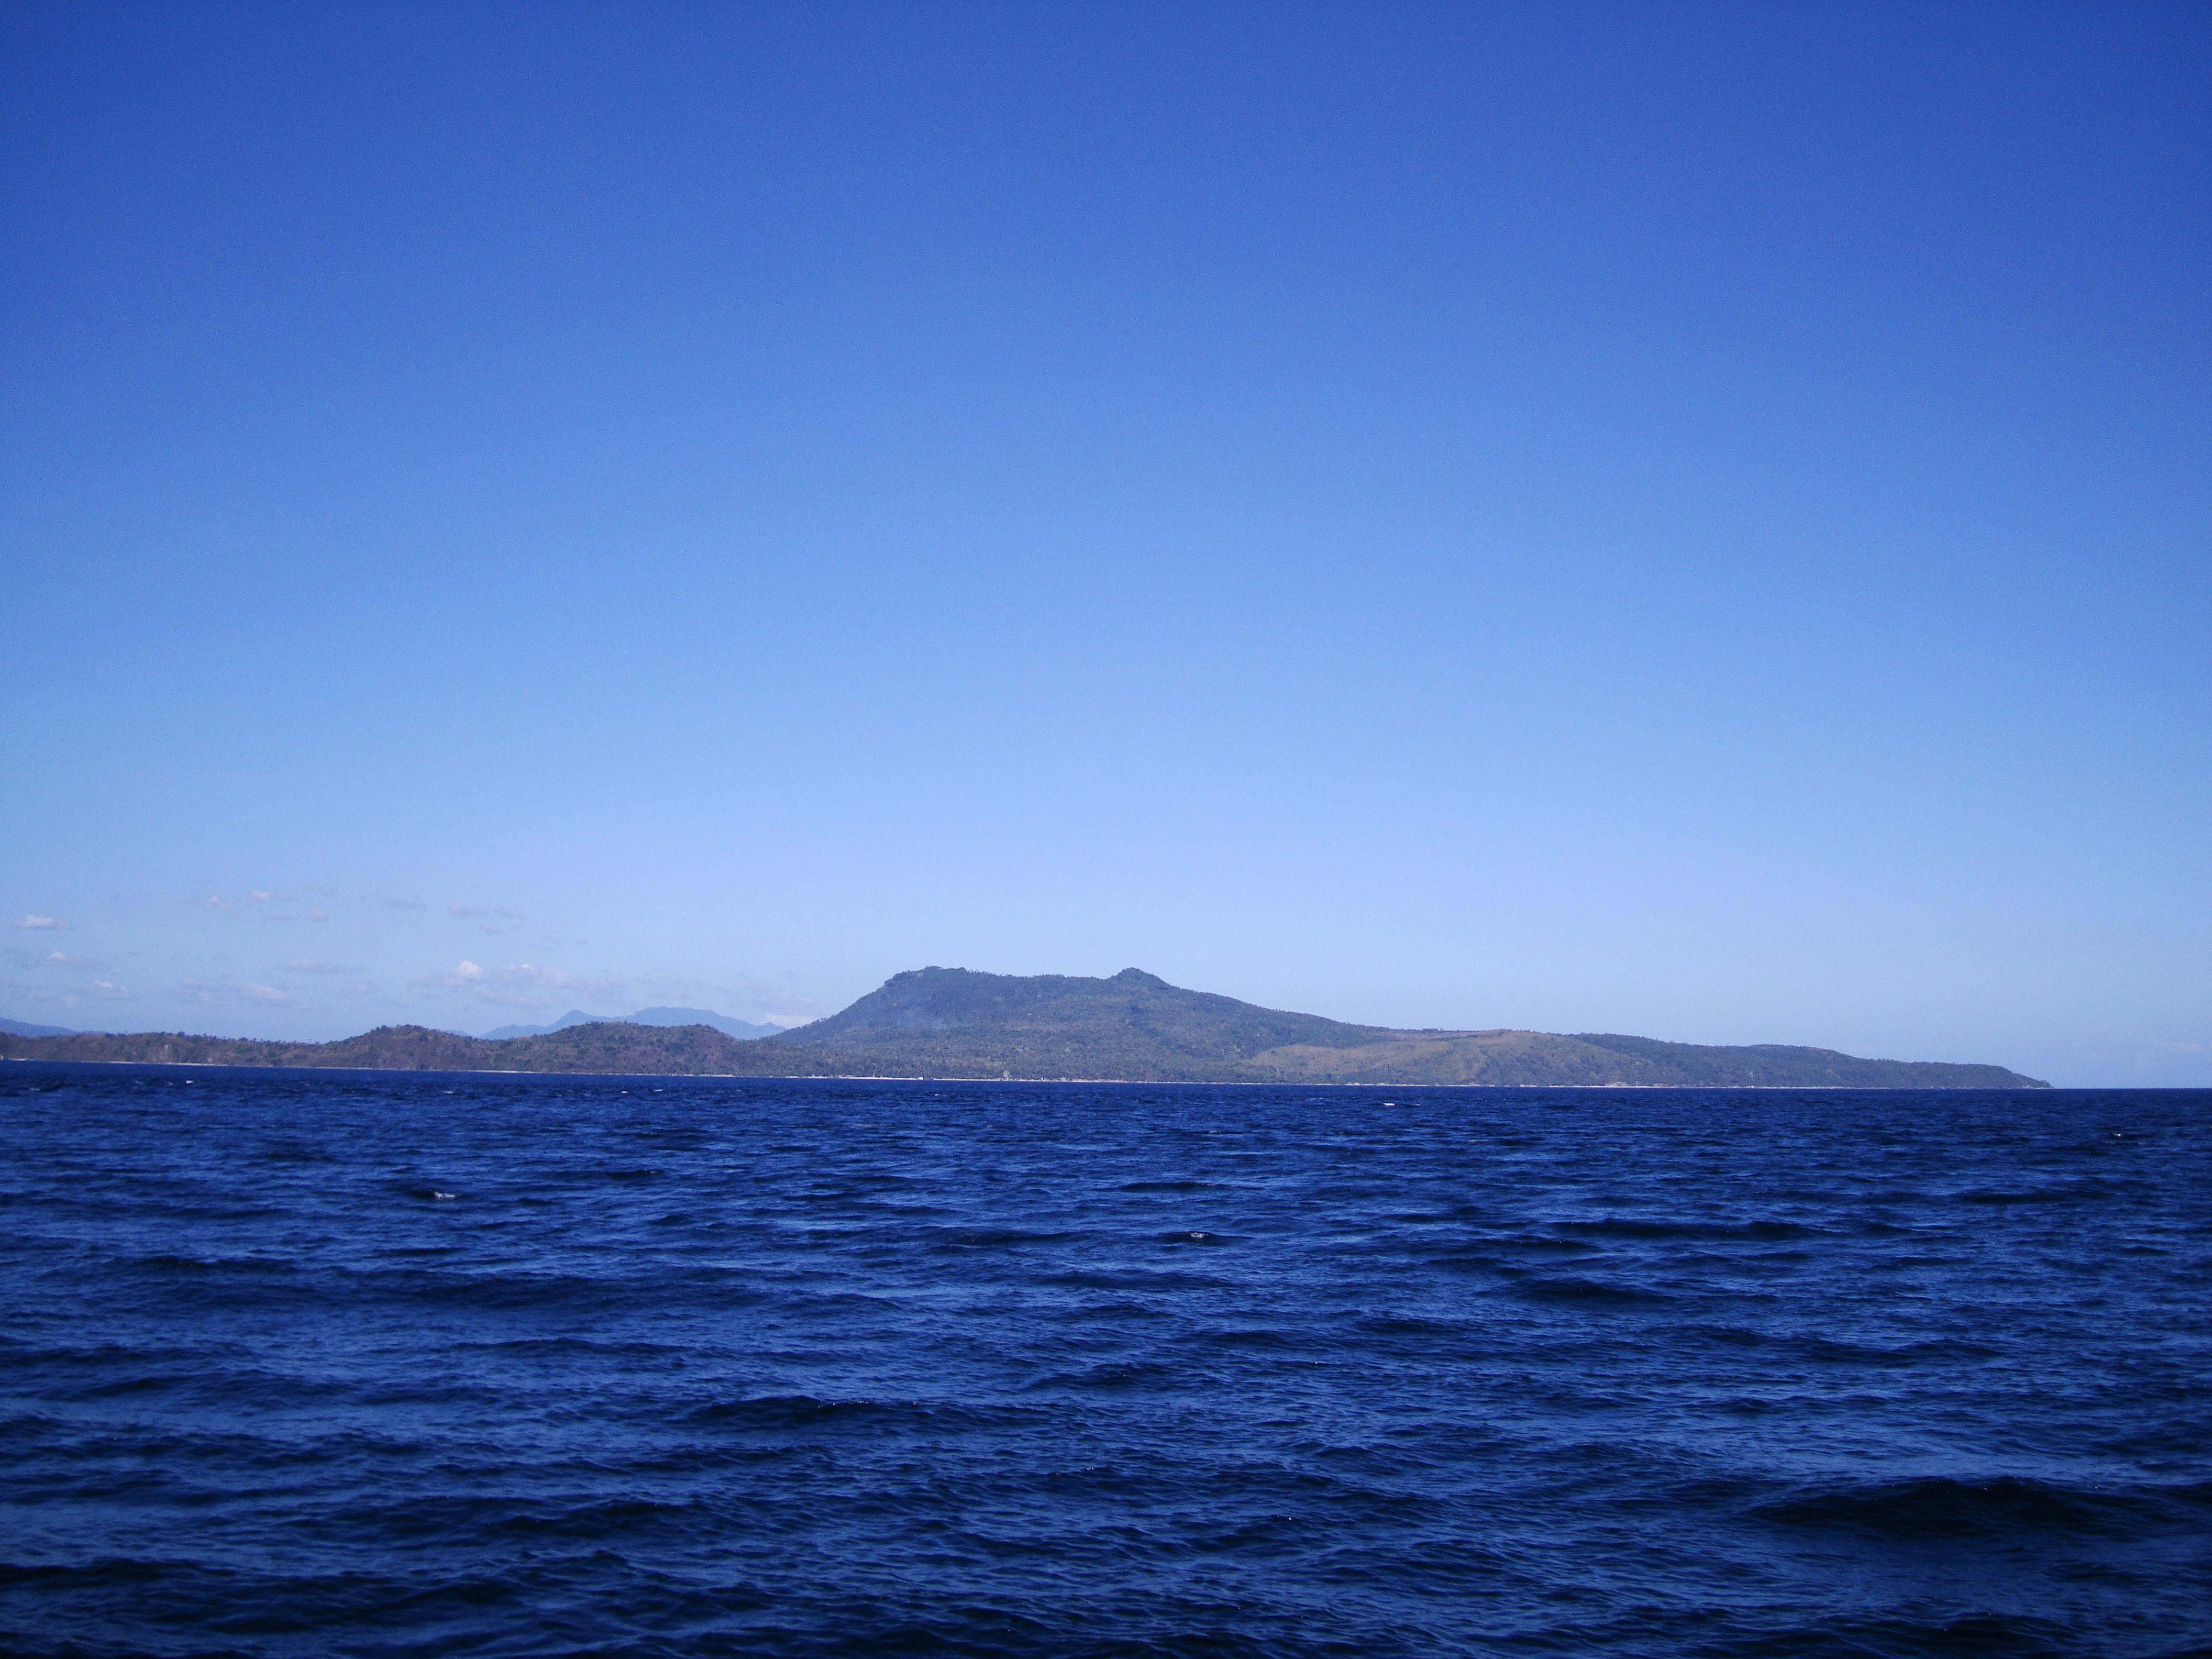 Maricahan Island Sepoc Point Batangas Philippines 01